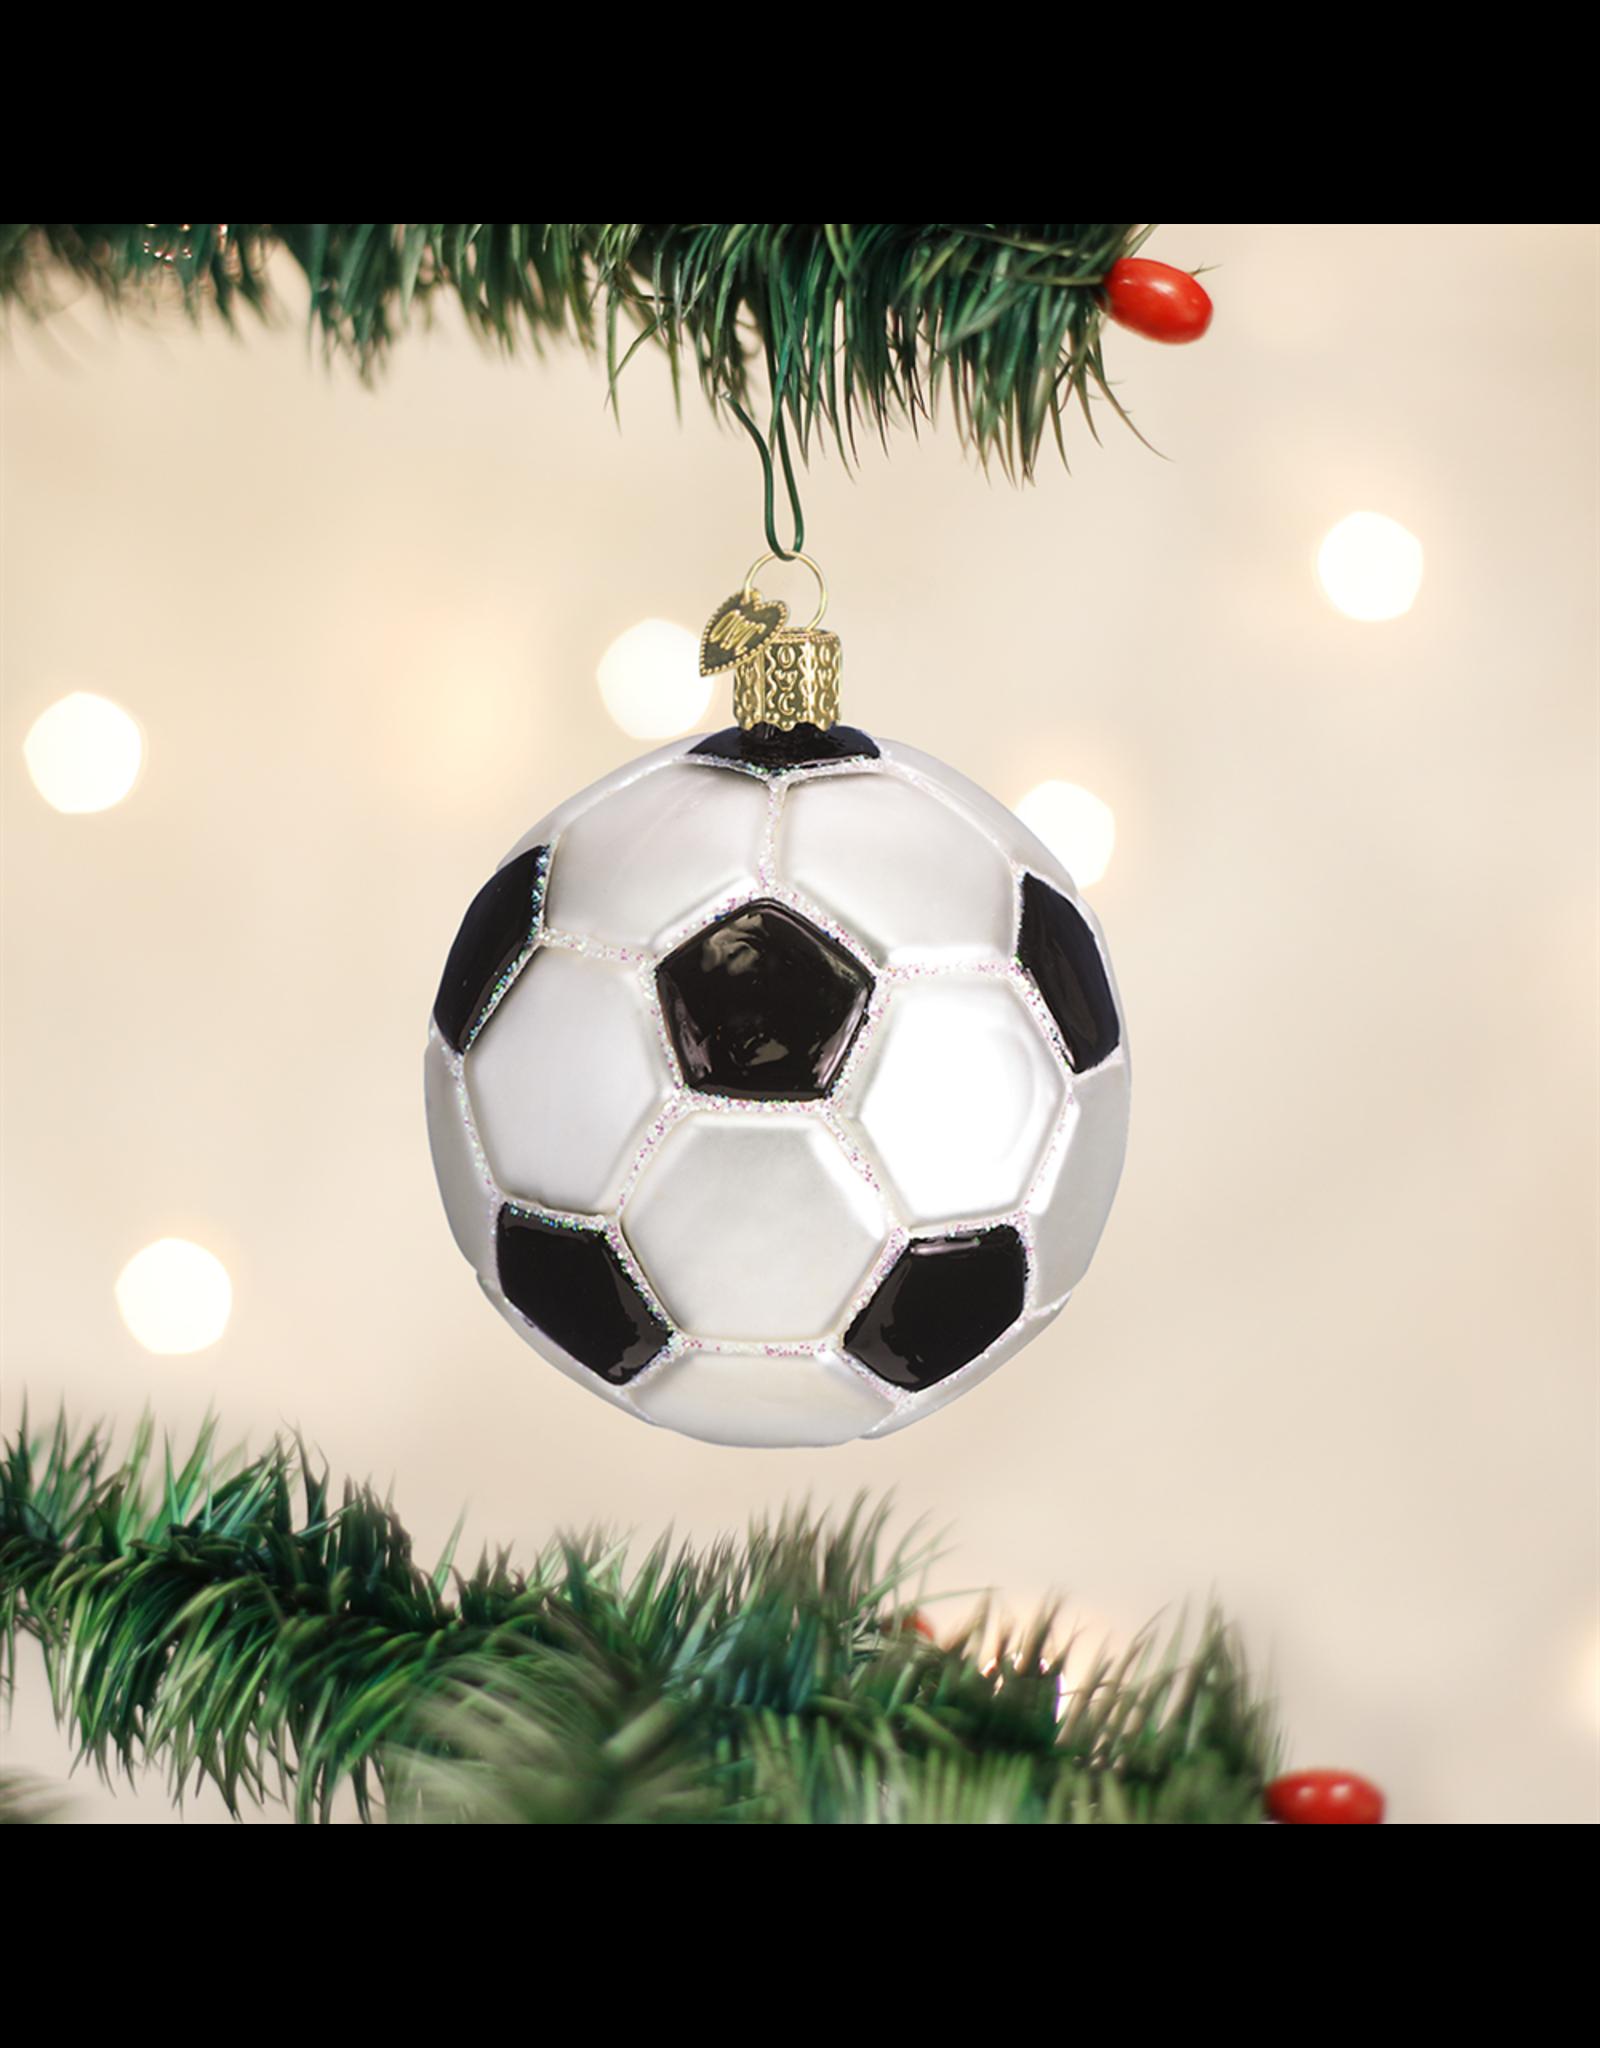 Old World Christmas Soccer Ball Ornament